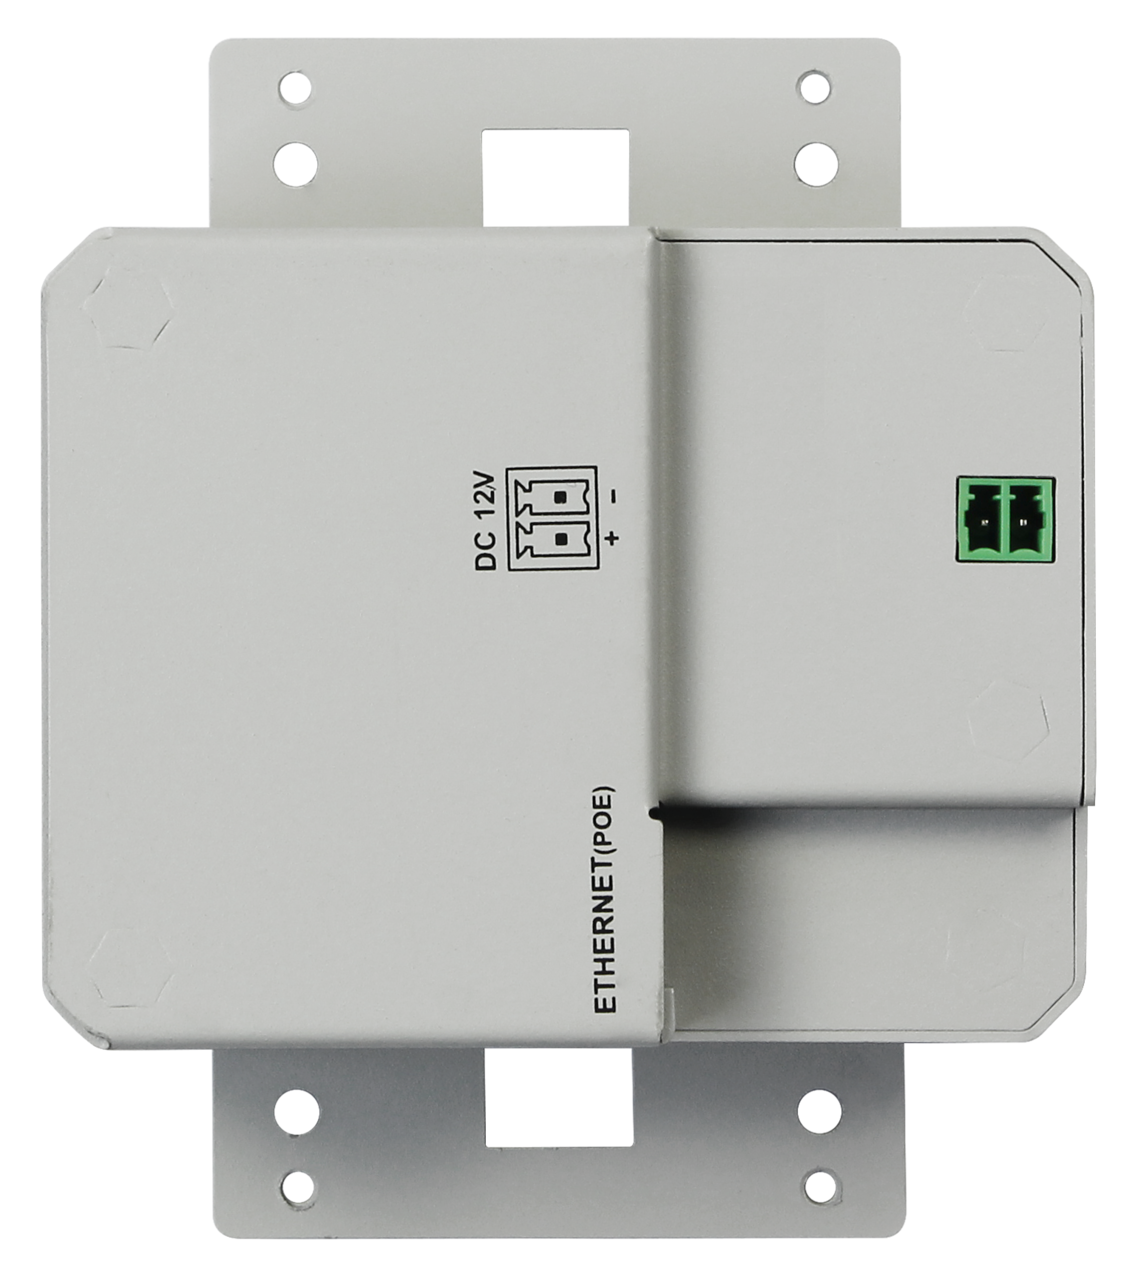 IPEX5001-WP-W - DigitalinxIP 5000 Series AV Over IP HDMI / VGA auto Switching Wall Plate Encoder